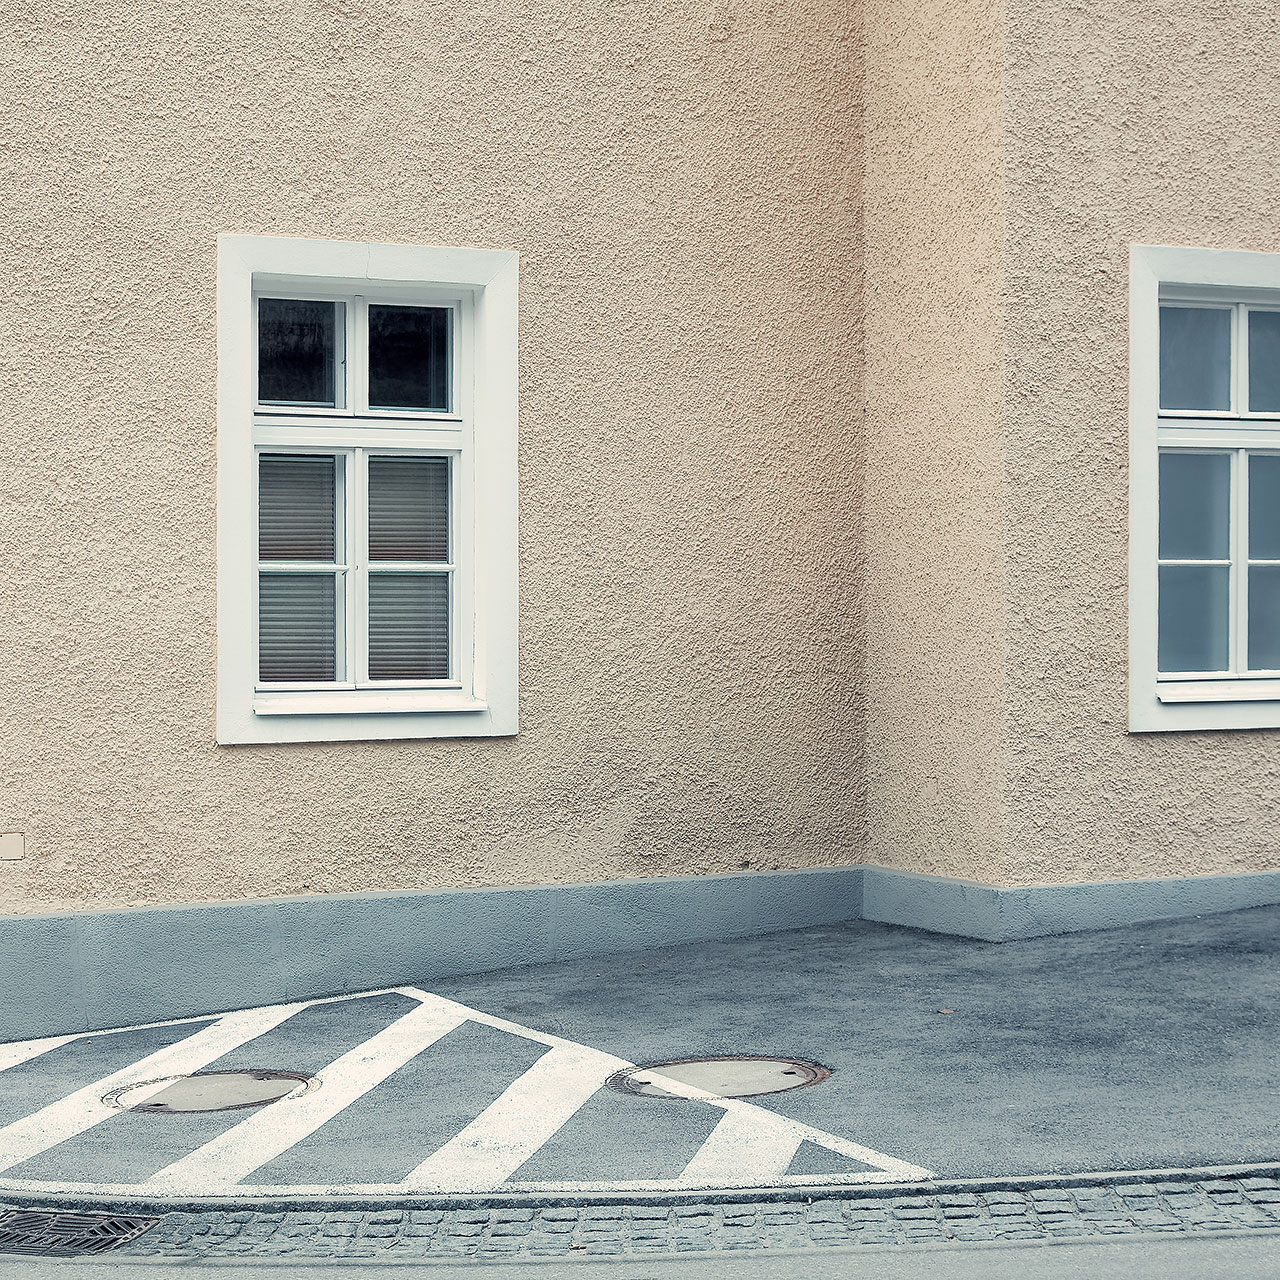 Peter Braunholz - Ecken (Corners) - Felix Schoeller Photoaward